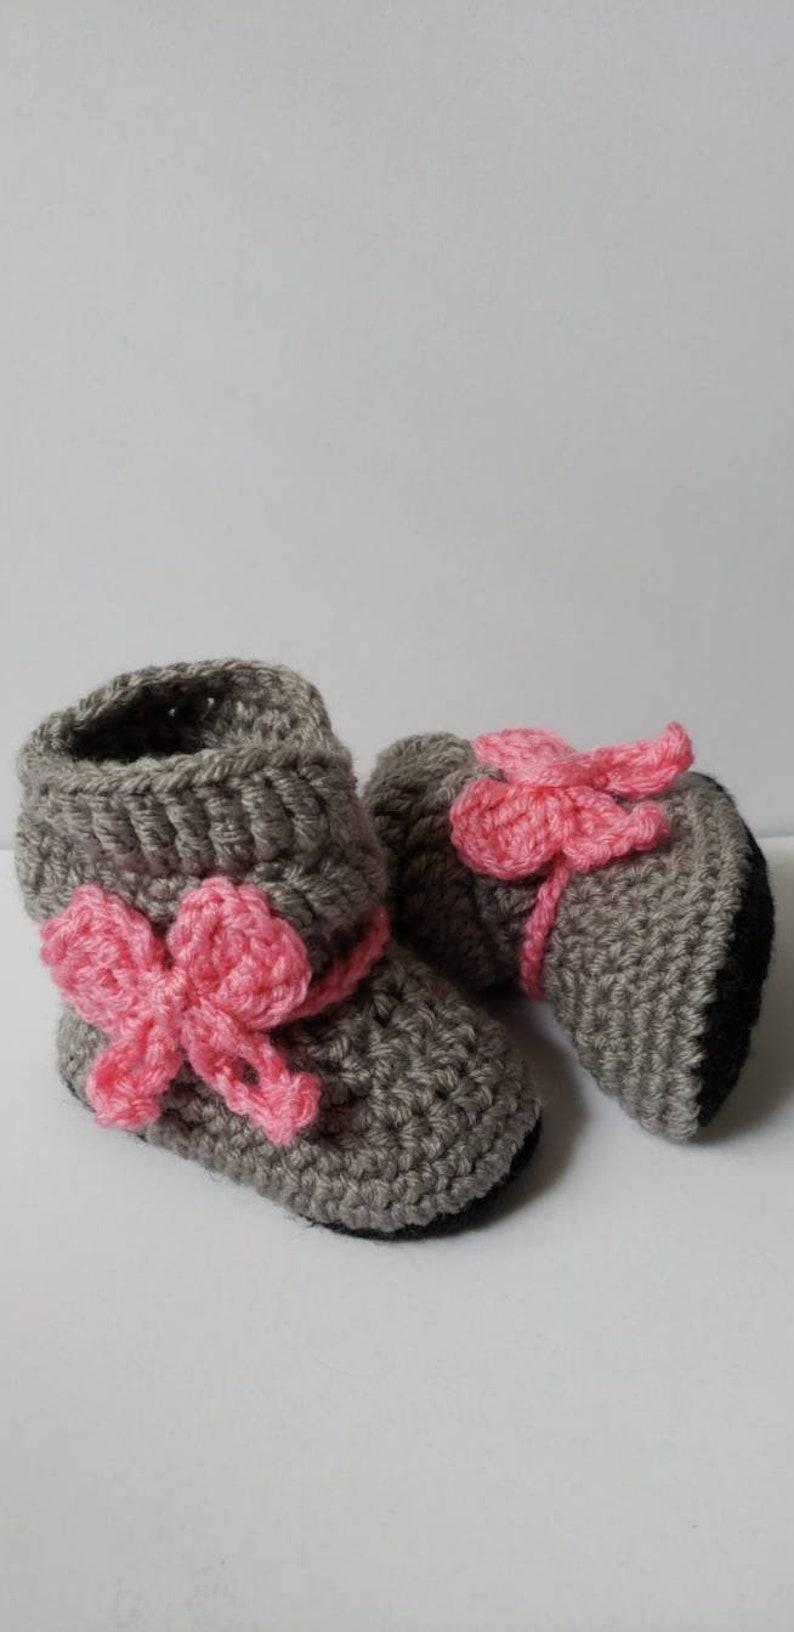 3645d1427628c baby girl shoes, crochet boots, winter, fall, knit baby shoes, baby  booties, baby shower gift, slouchy baby boots, crochet baby shoes, girls